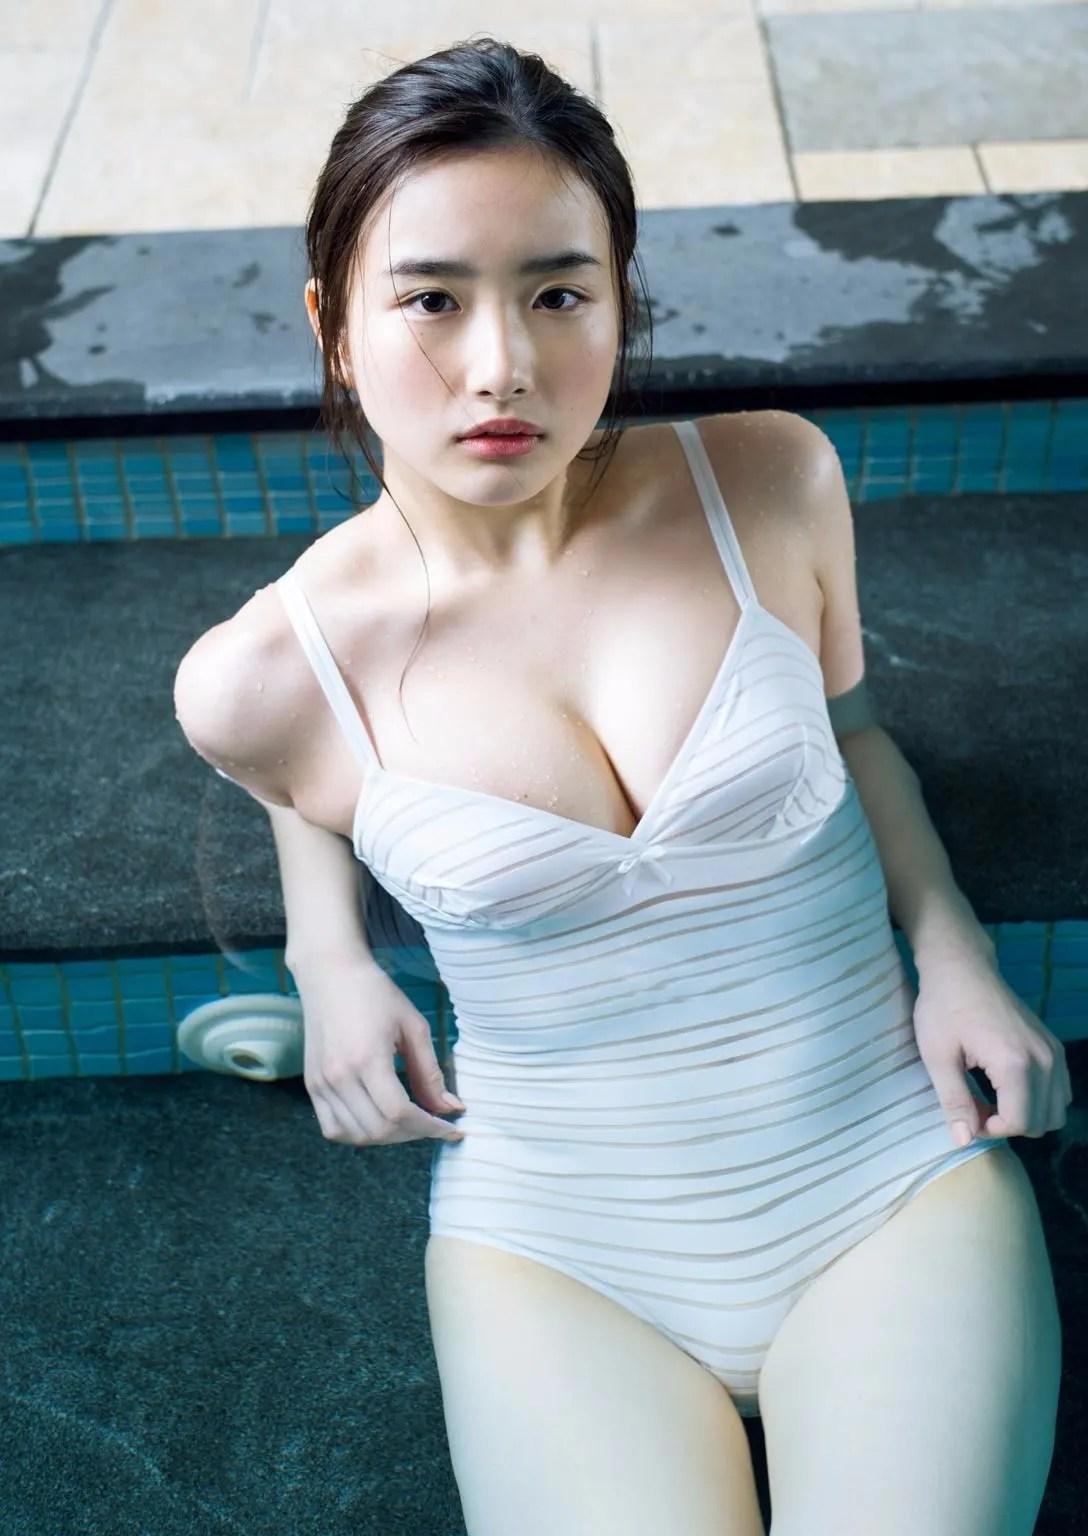 https://i1.wp.com/blogimg.goo.ne.jp/user_image/33/b9/0c903442bdcf0867dc9be58ae0c62b47.jpg